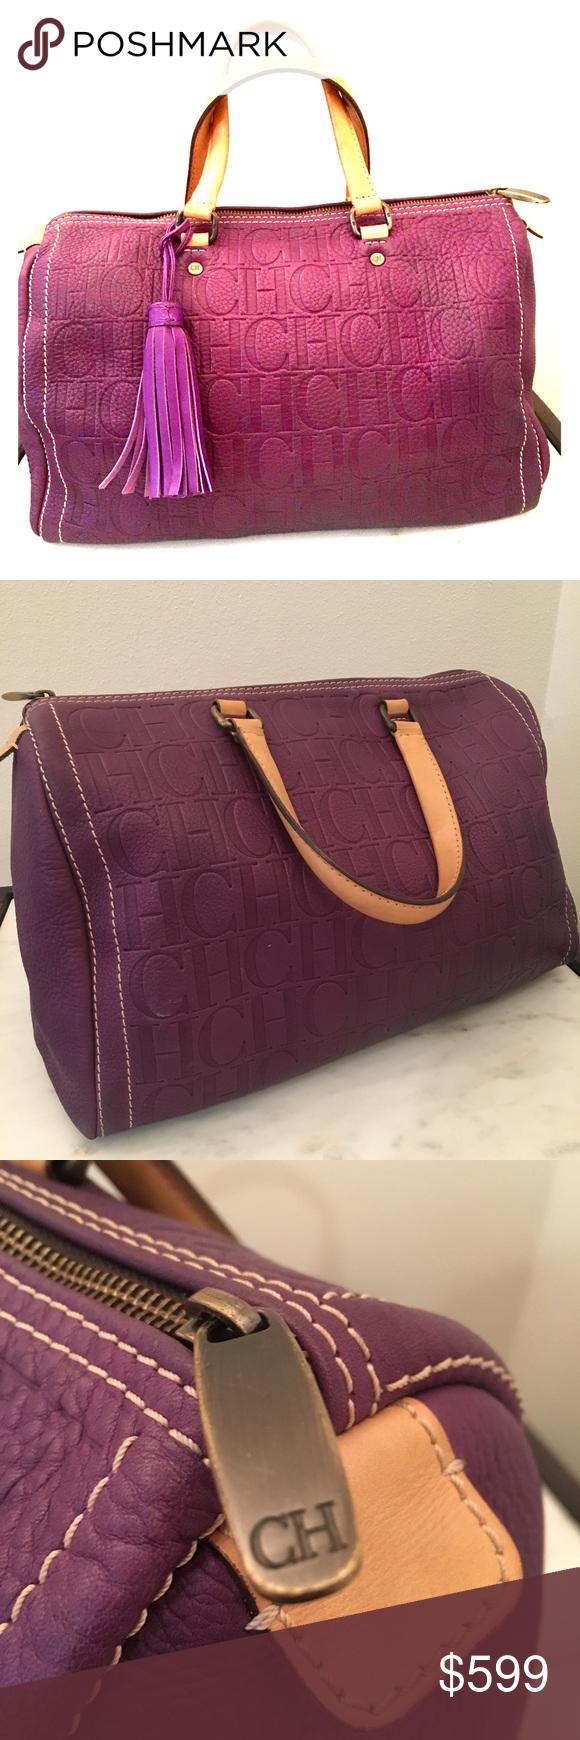 8e344a1334a6 Carolina Herrera Andy Bag Purple Purple embossed leather logo Carolina  Herrera Medium Andy Bag with brushed